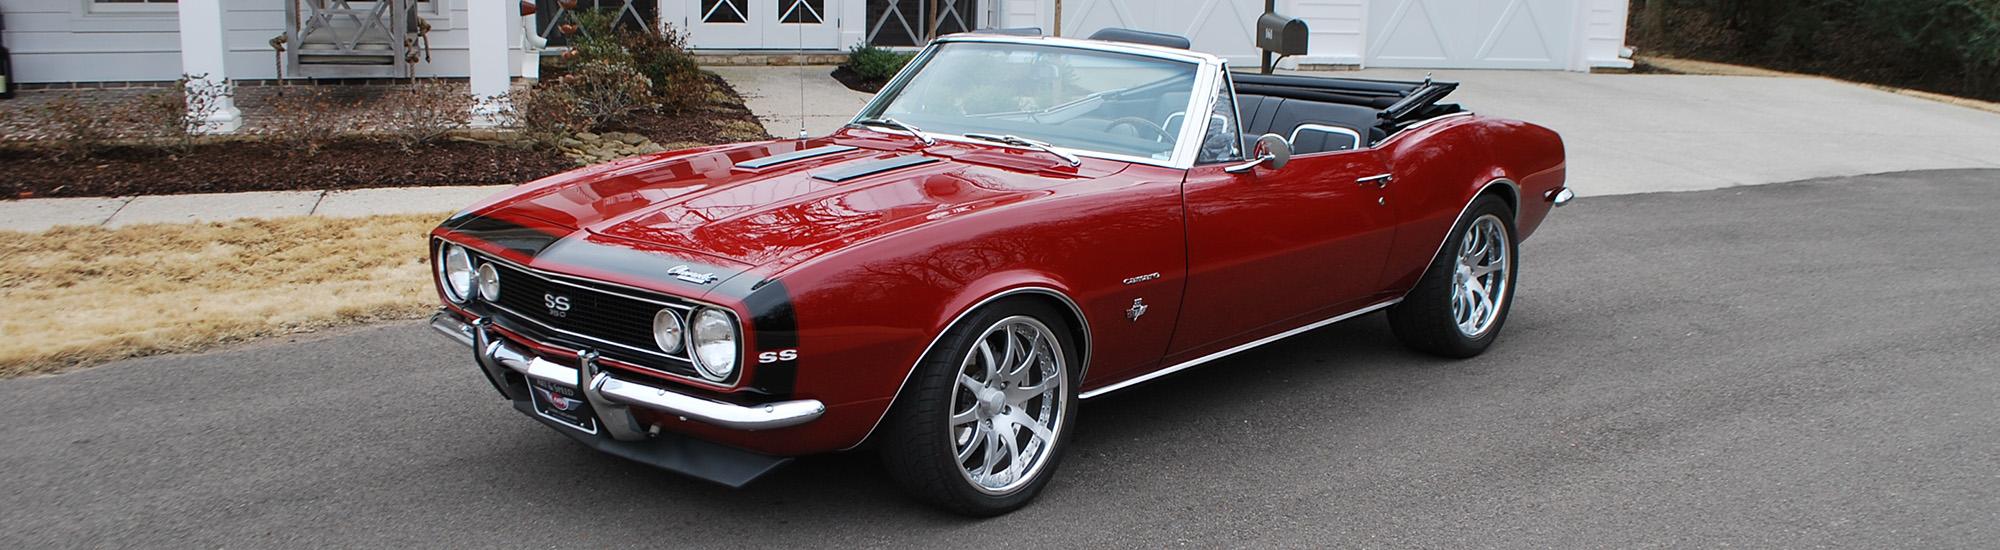 Vintage Car Rental Memphis